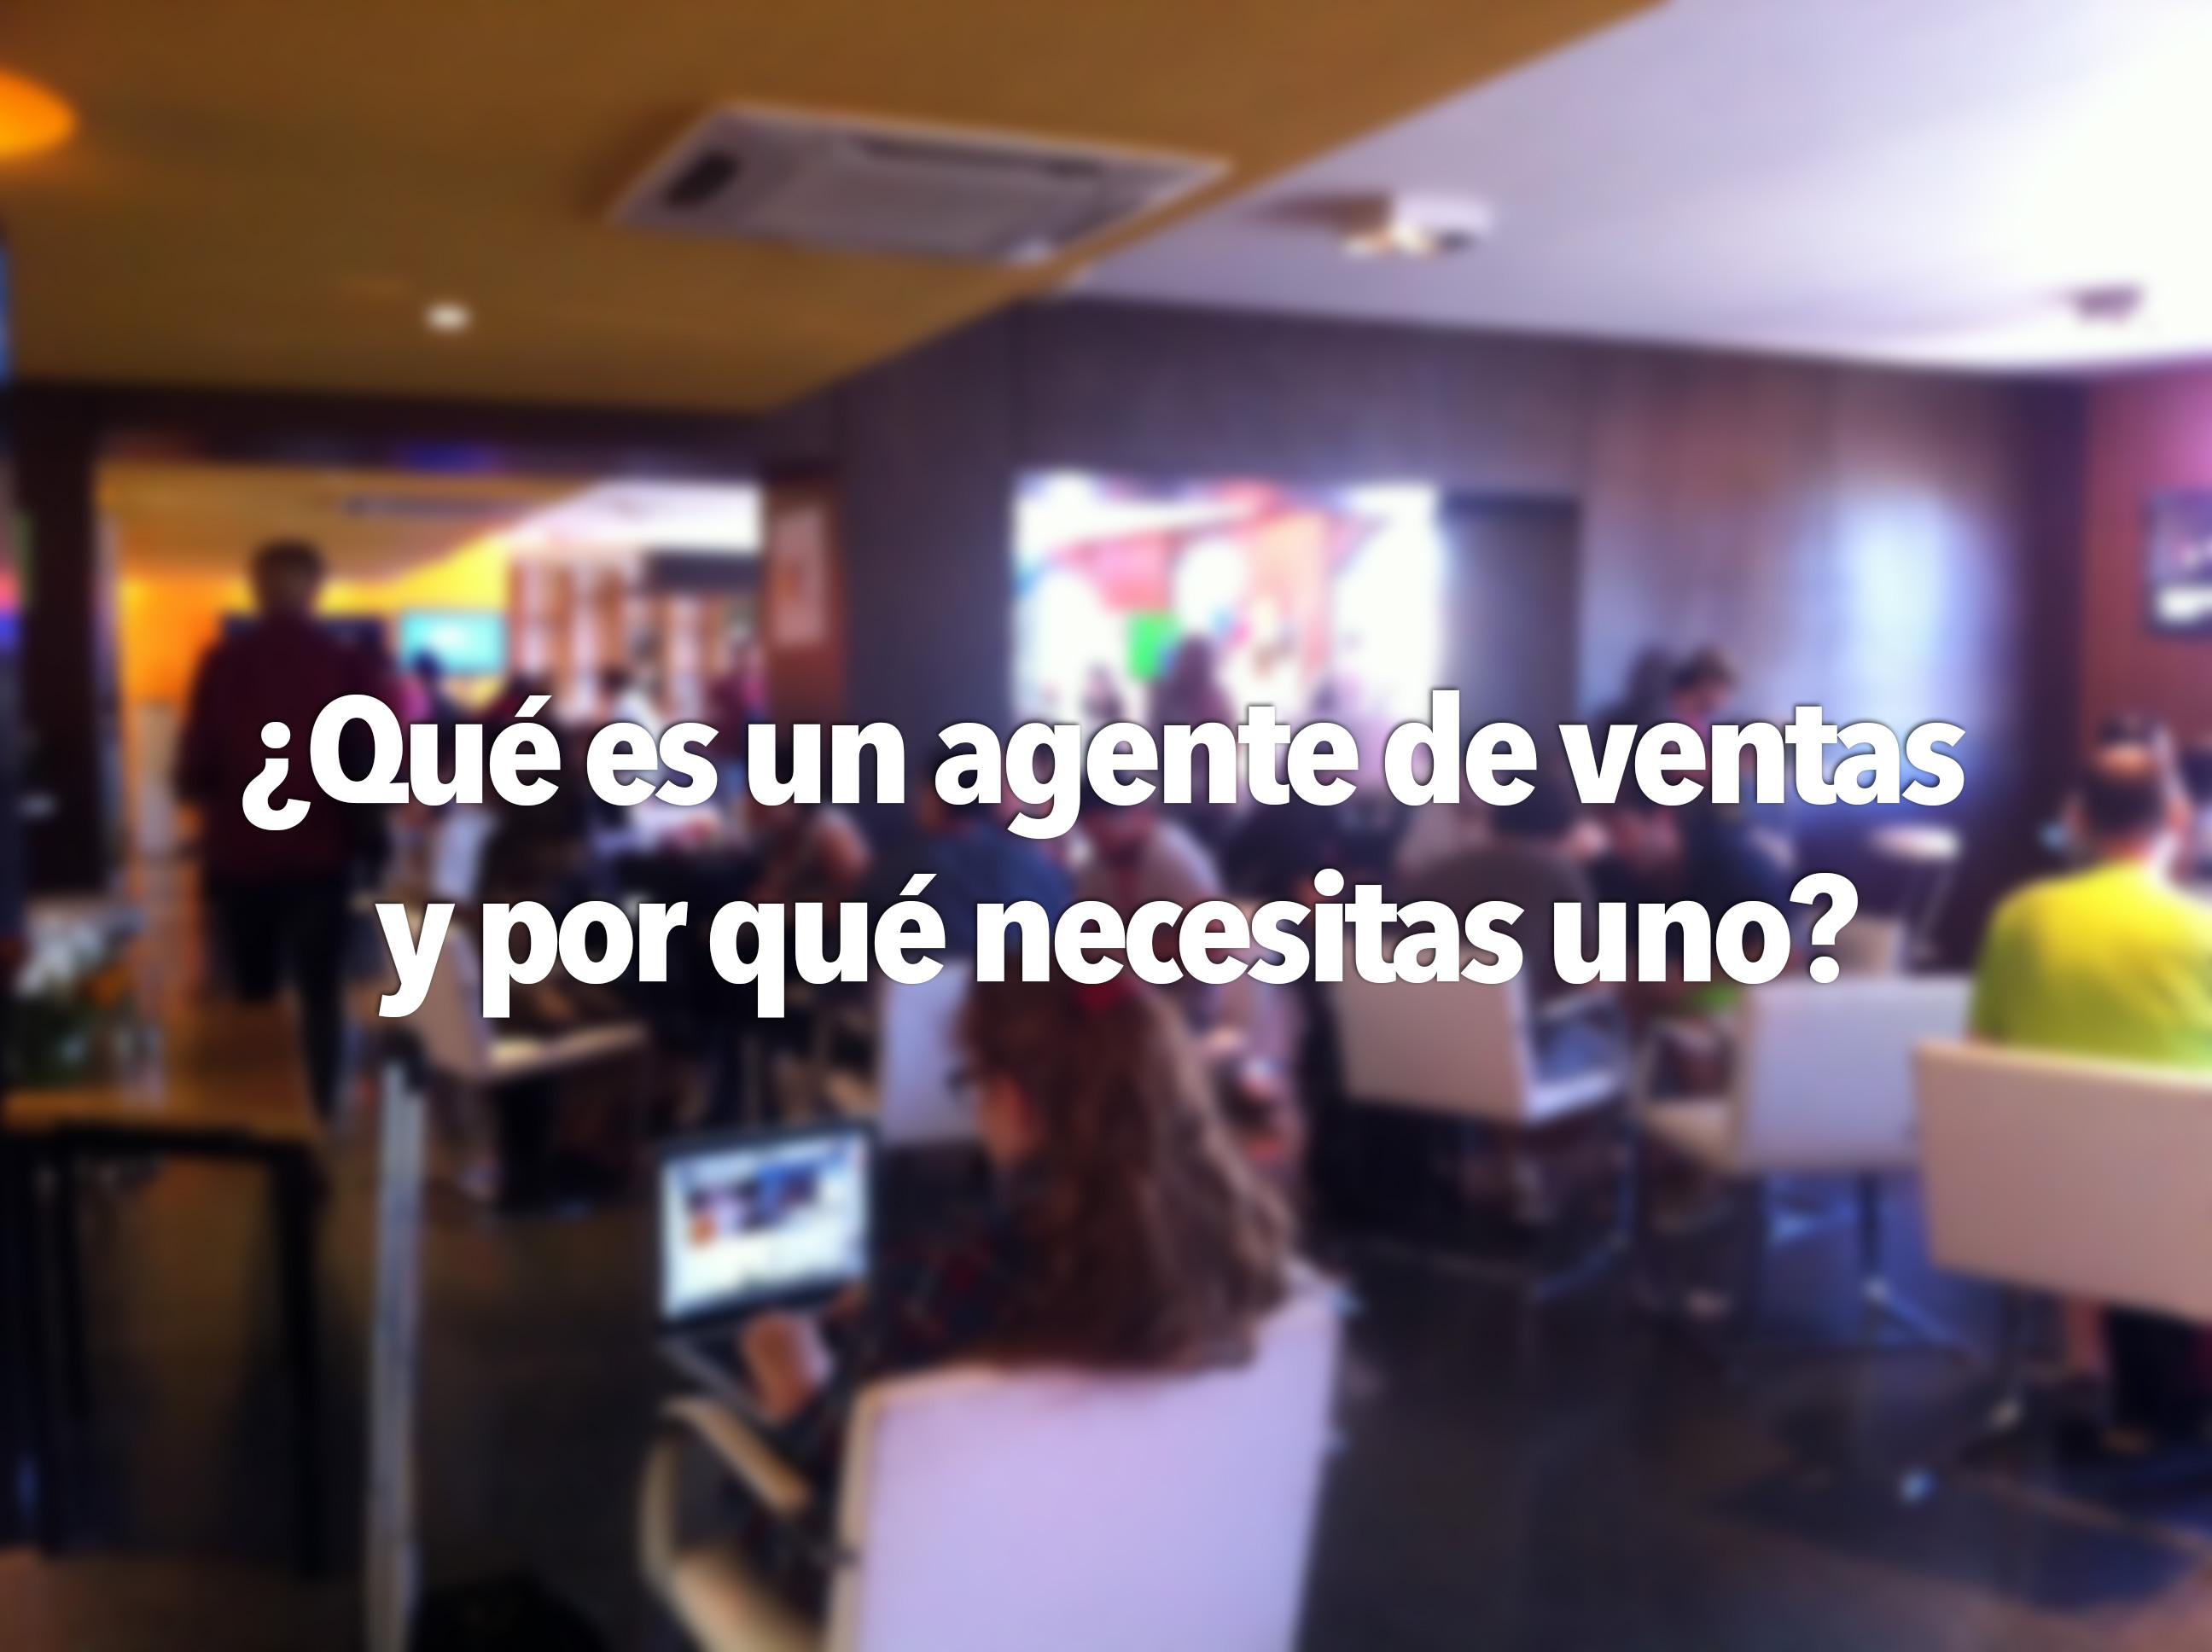 agentes_de_ventas_001